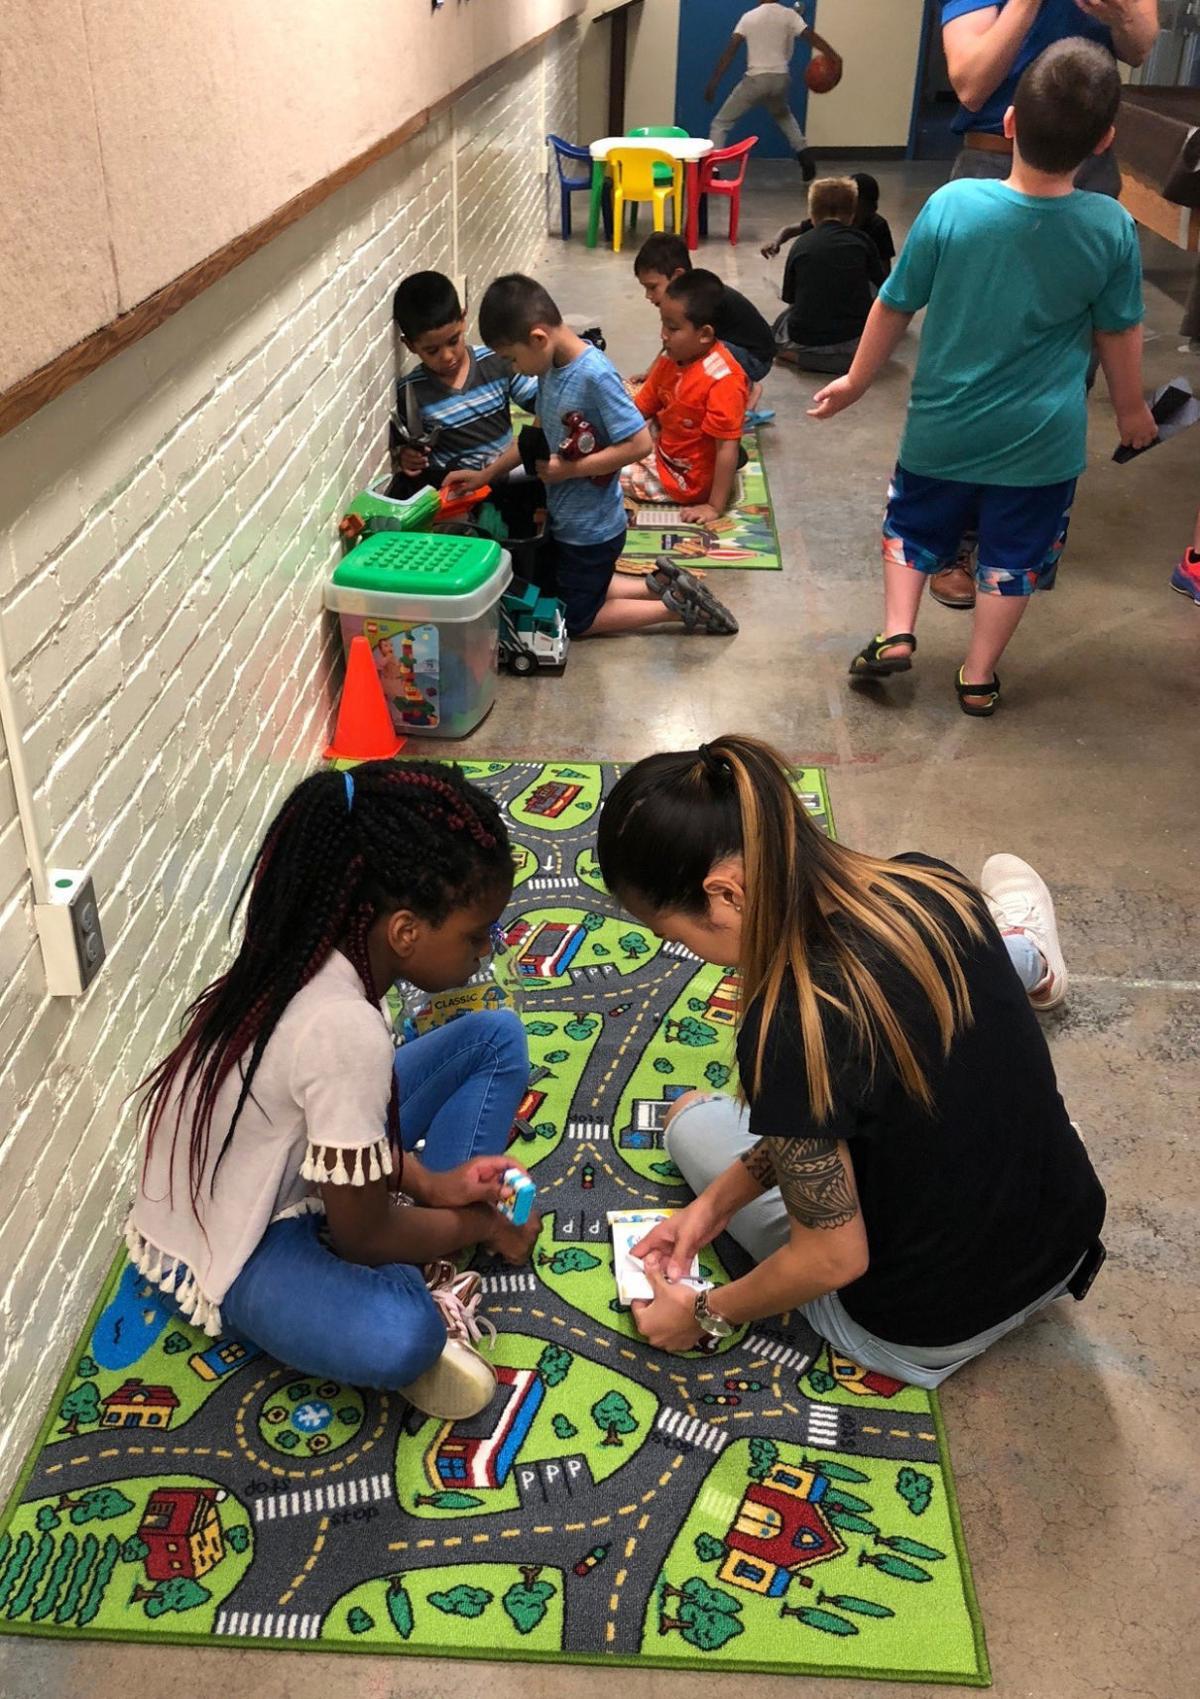 Kids play on activity mats